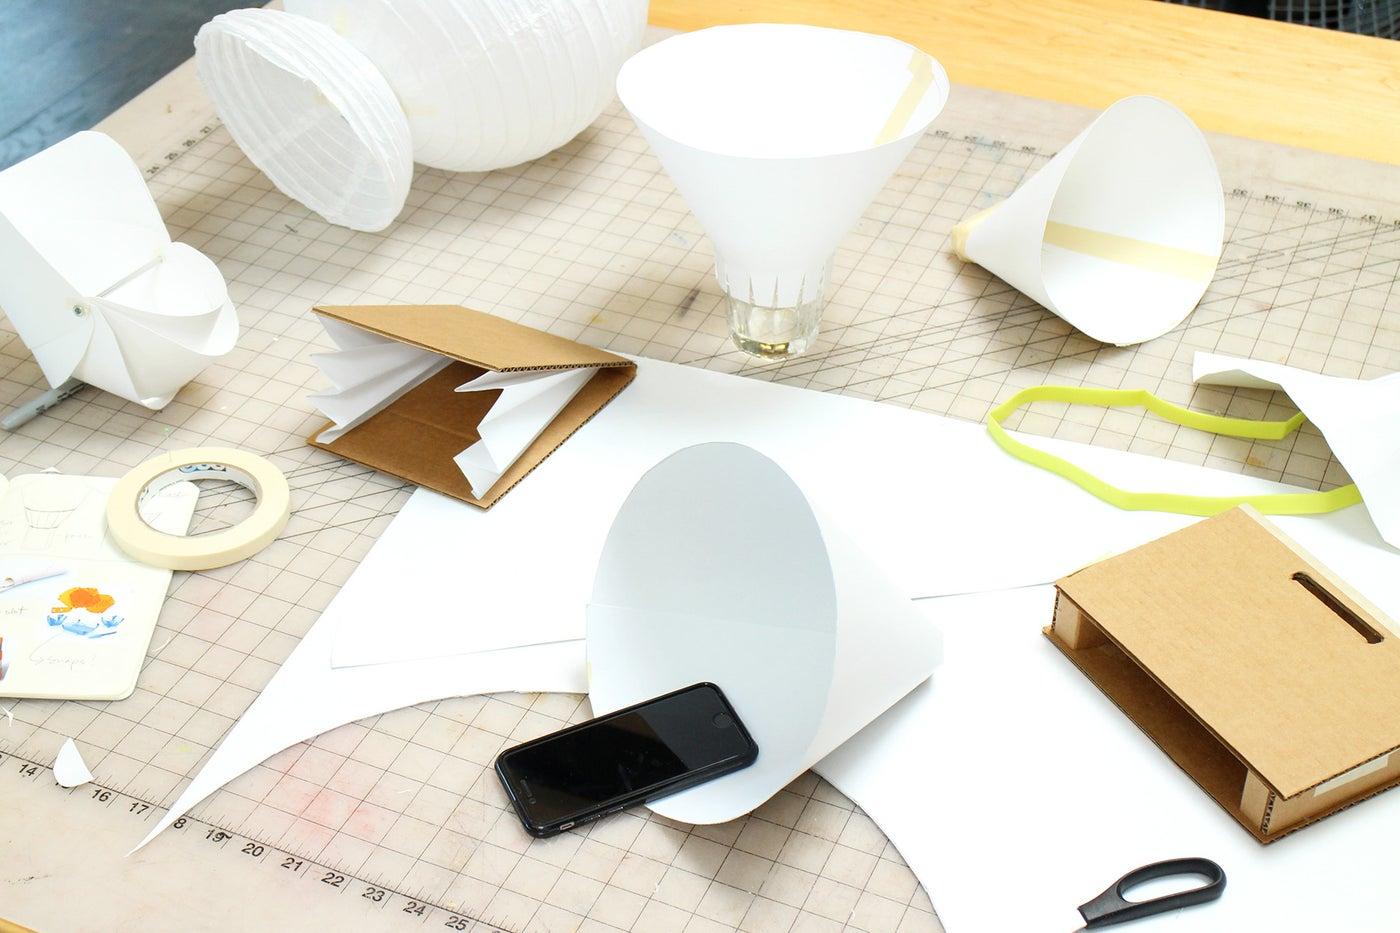 Iteration: Prototyping & Testing